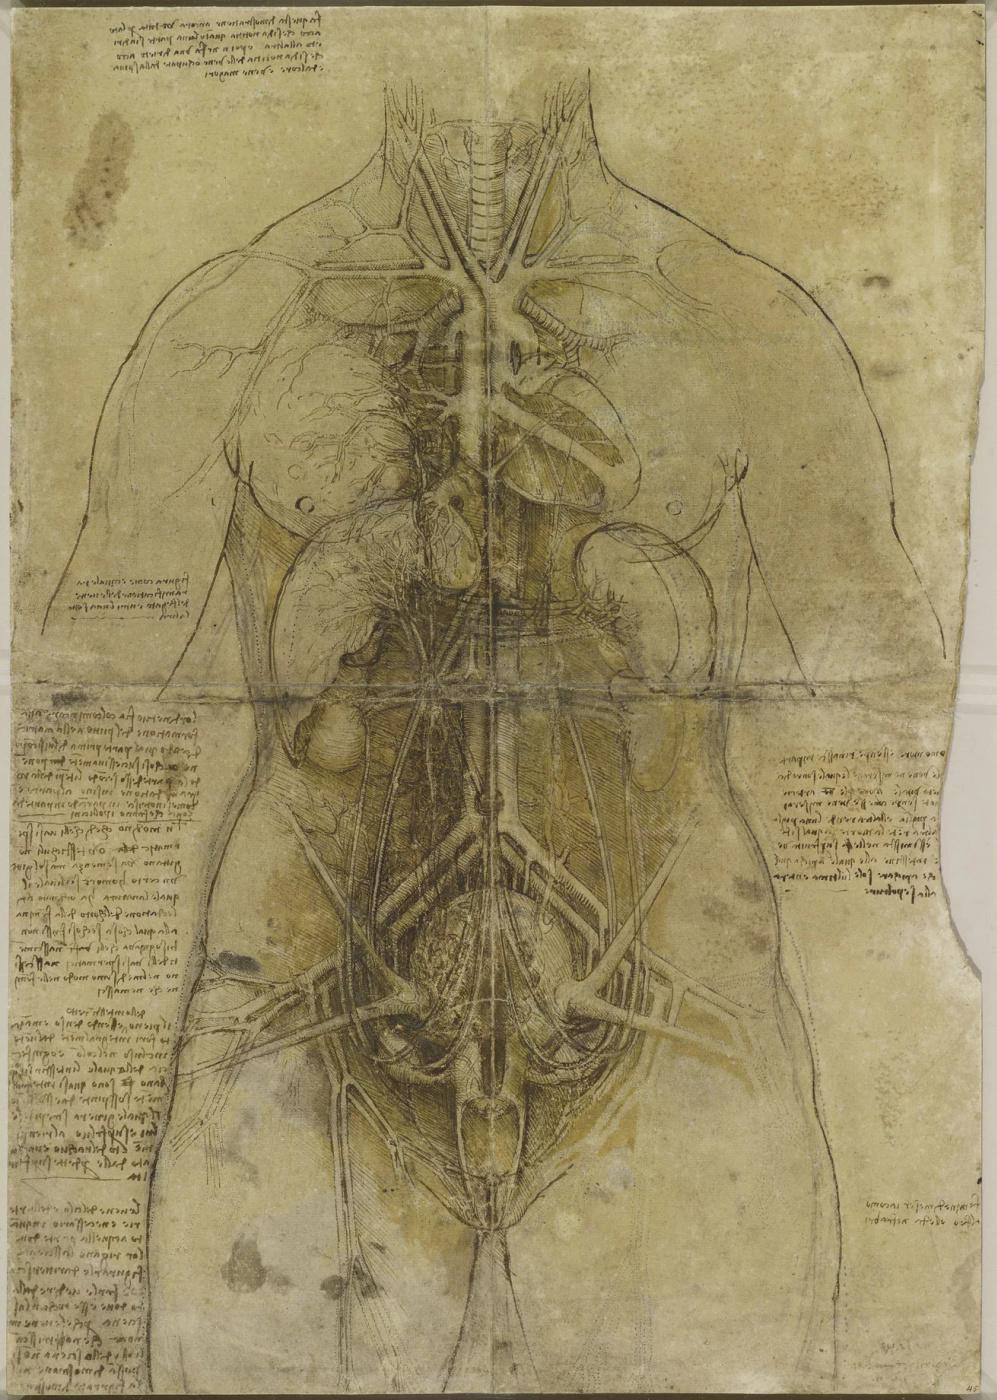 Leonardo da Vinci. Cardiovascular system and main organs of a woman